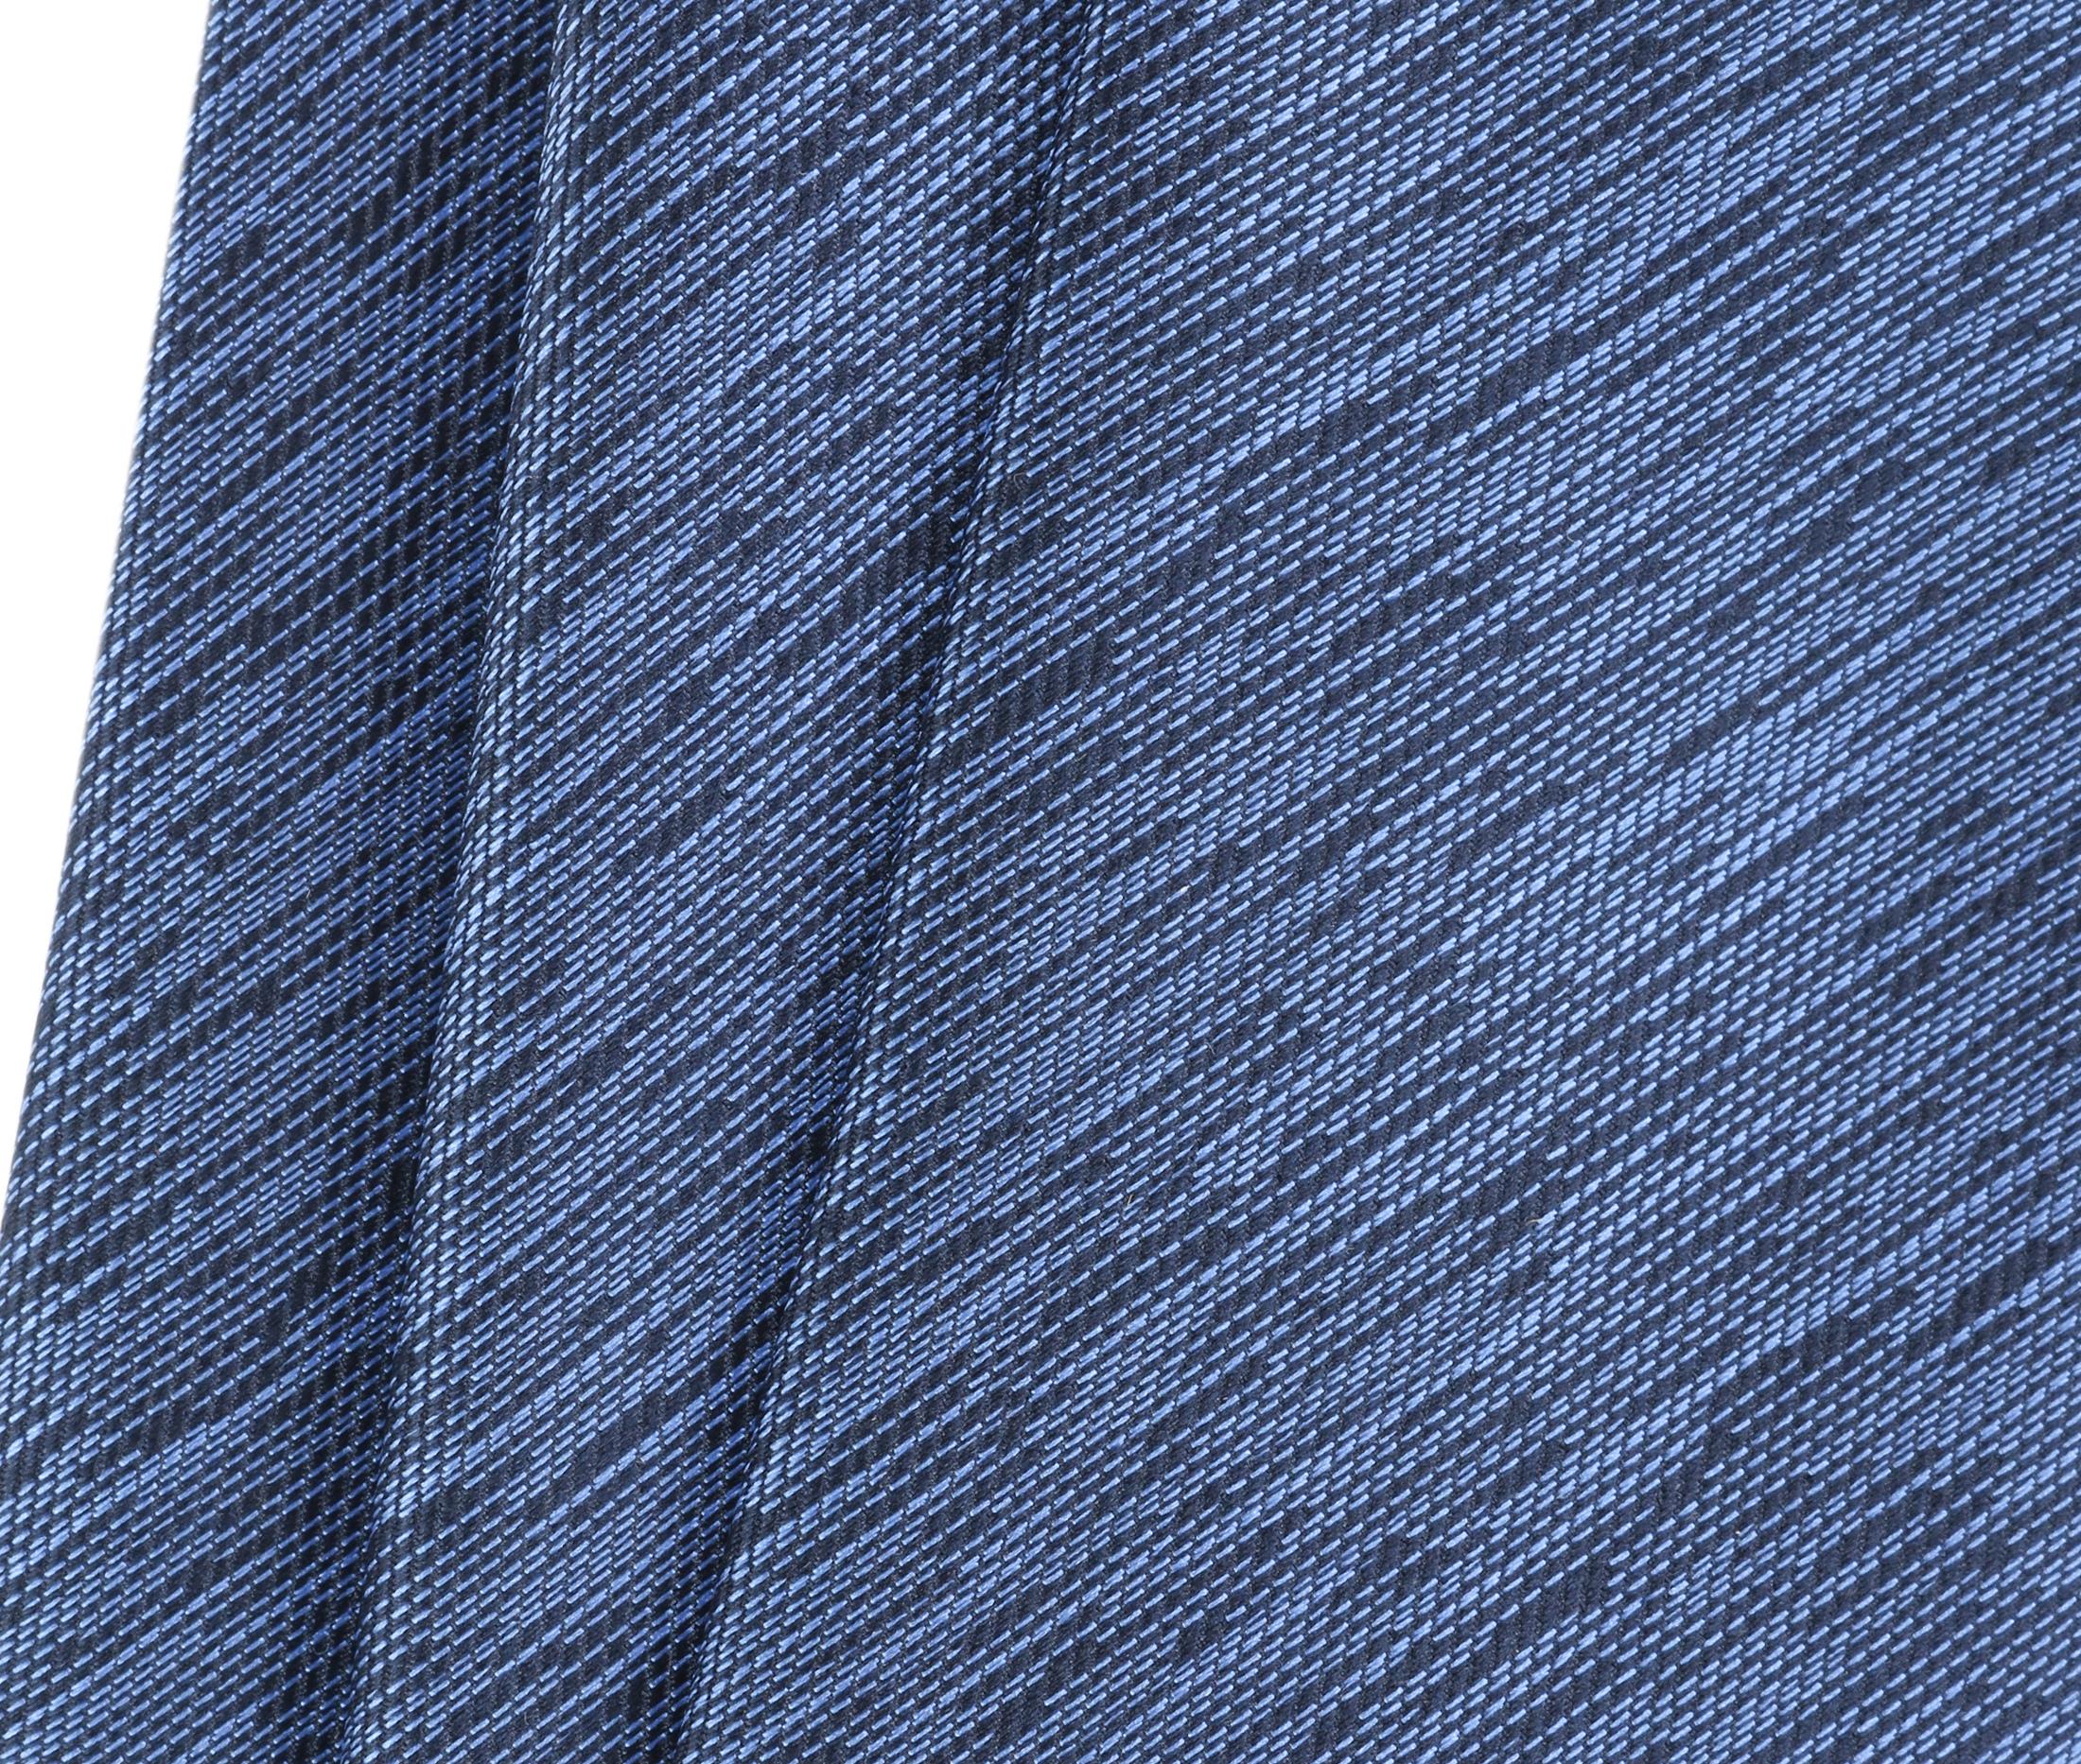 Krawatte Seide Blue 9-17 foto 2